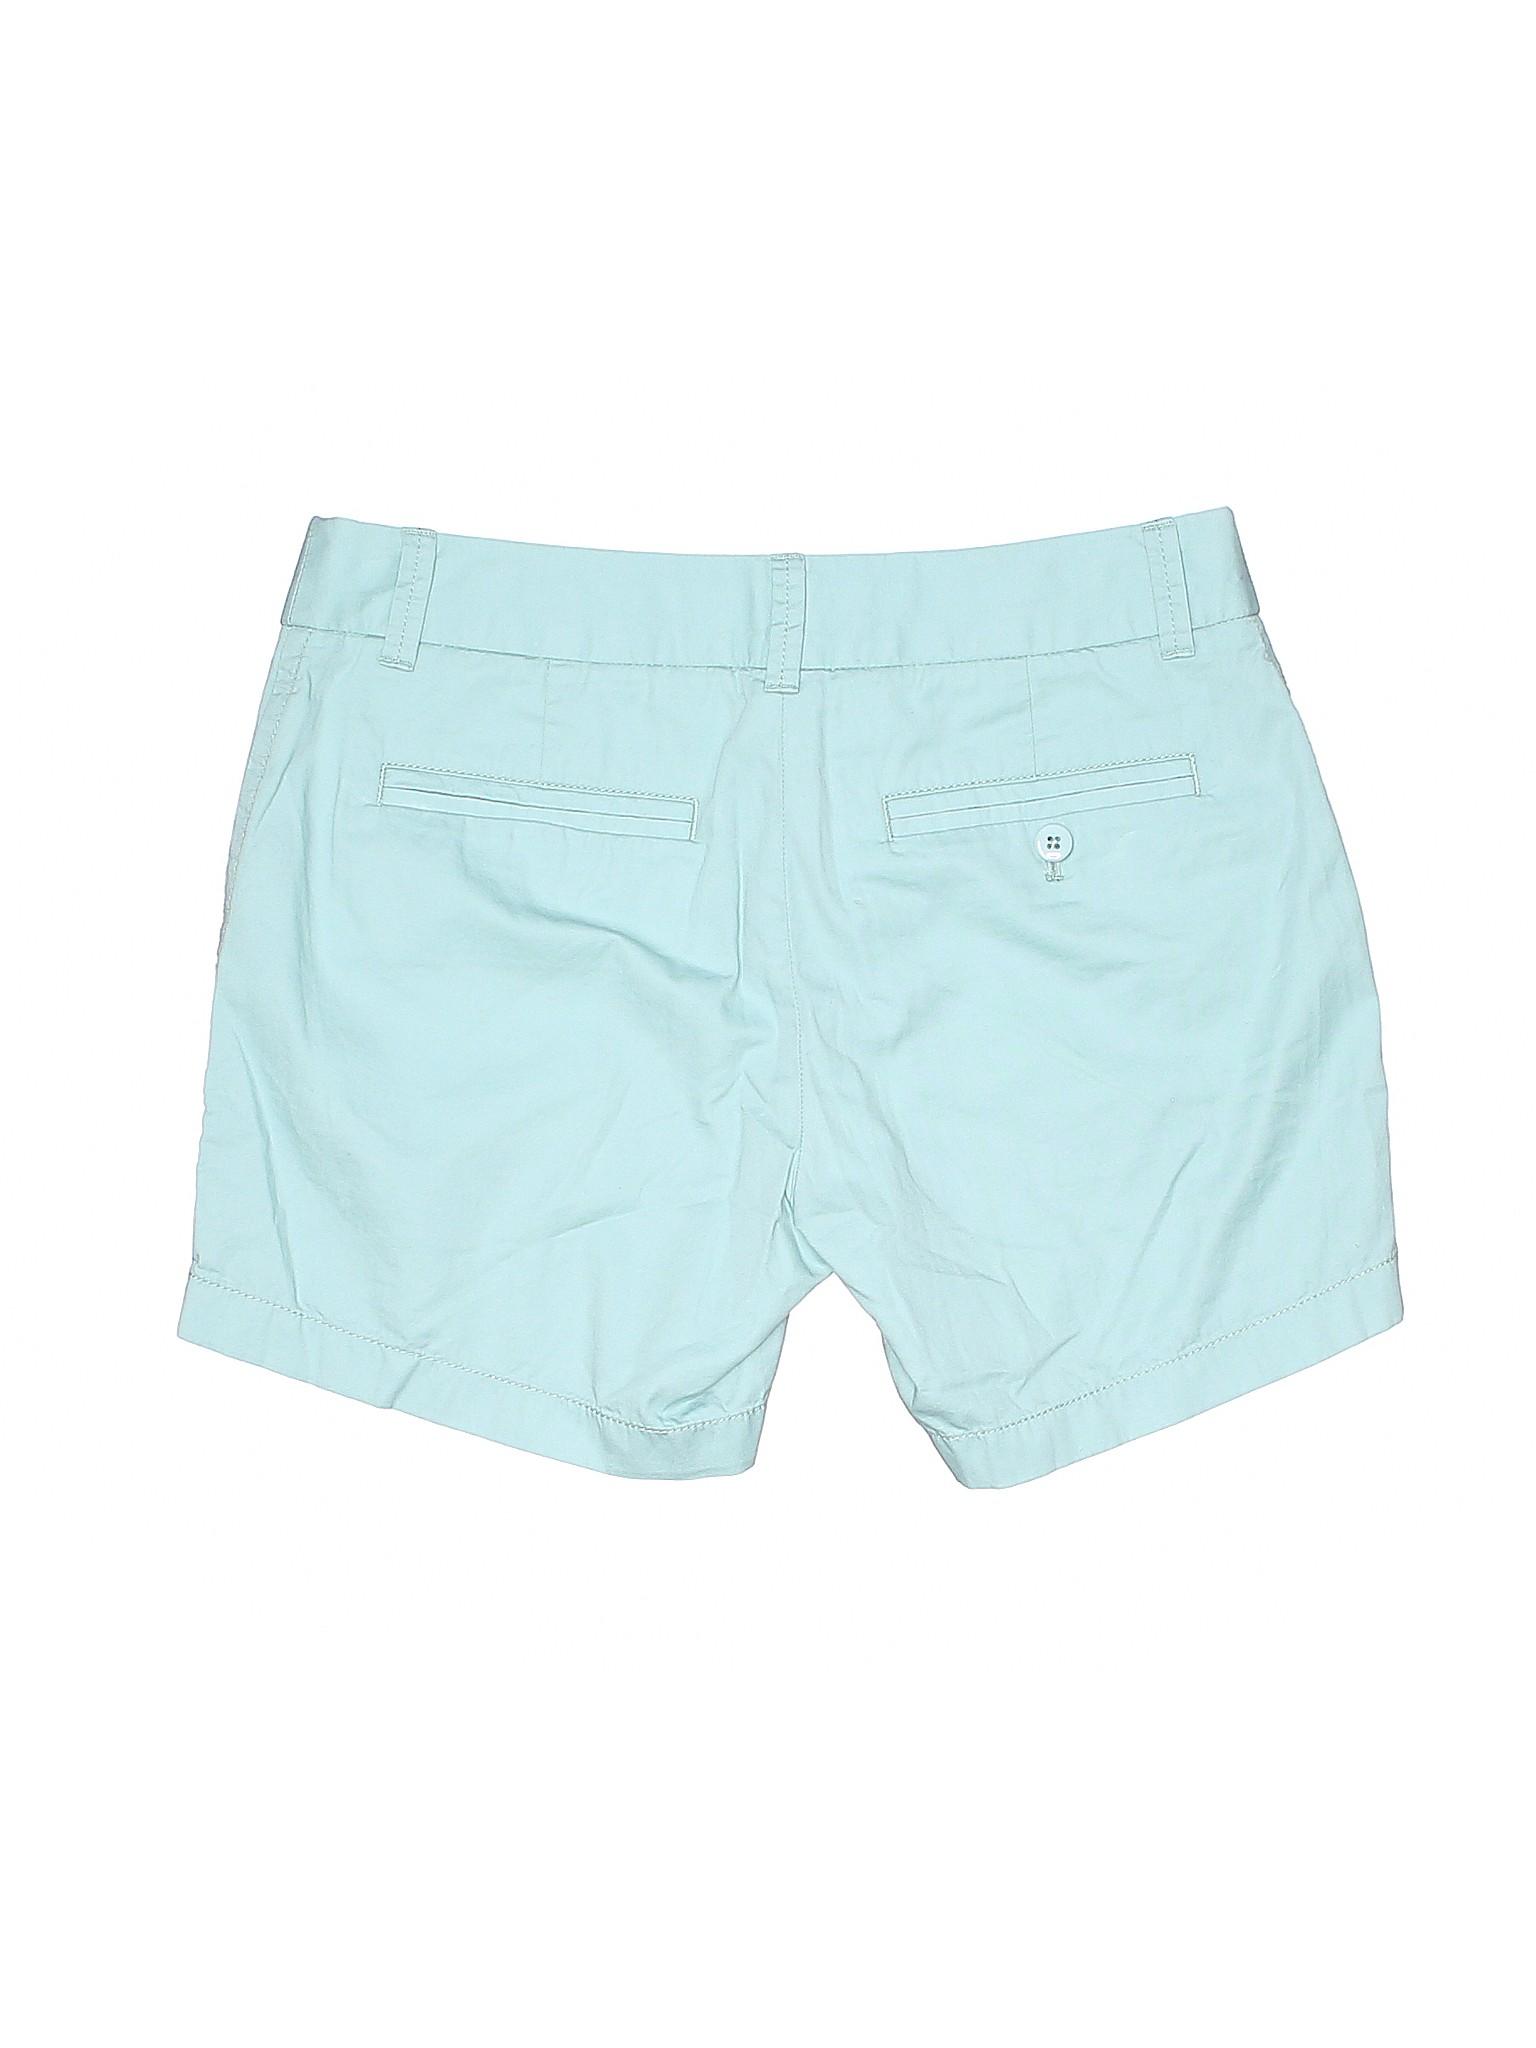 Boutique Shorts leisure Khaki J Crew nqaFqfO